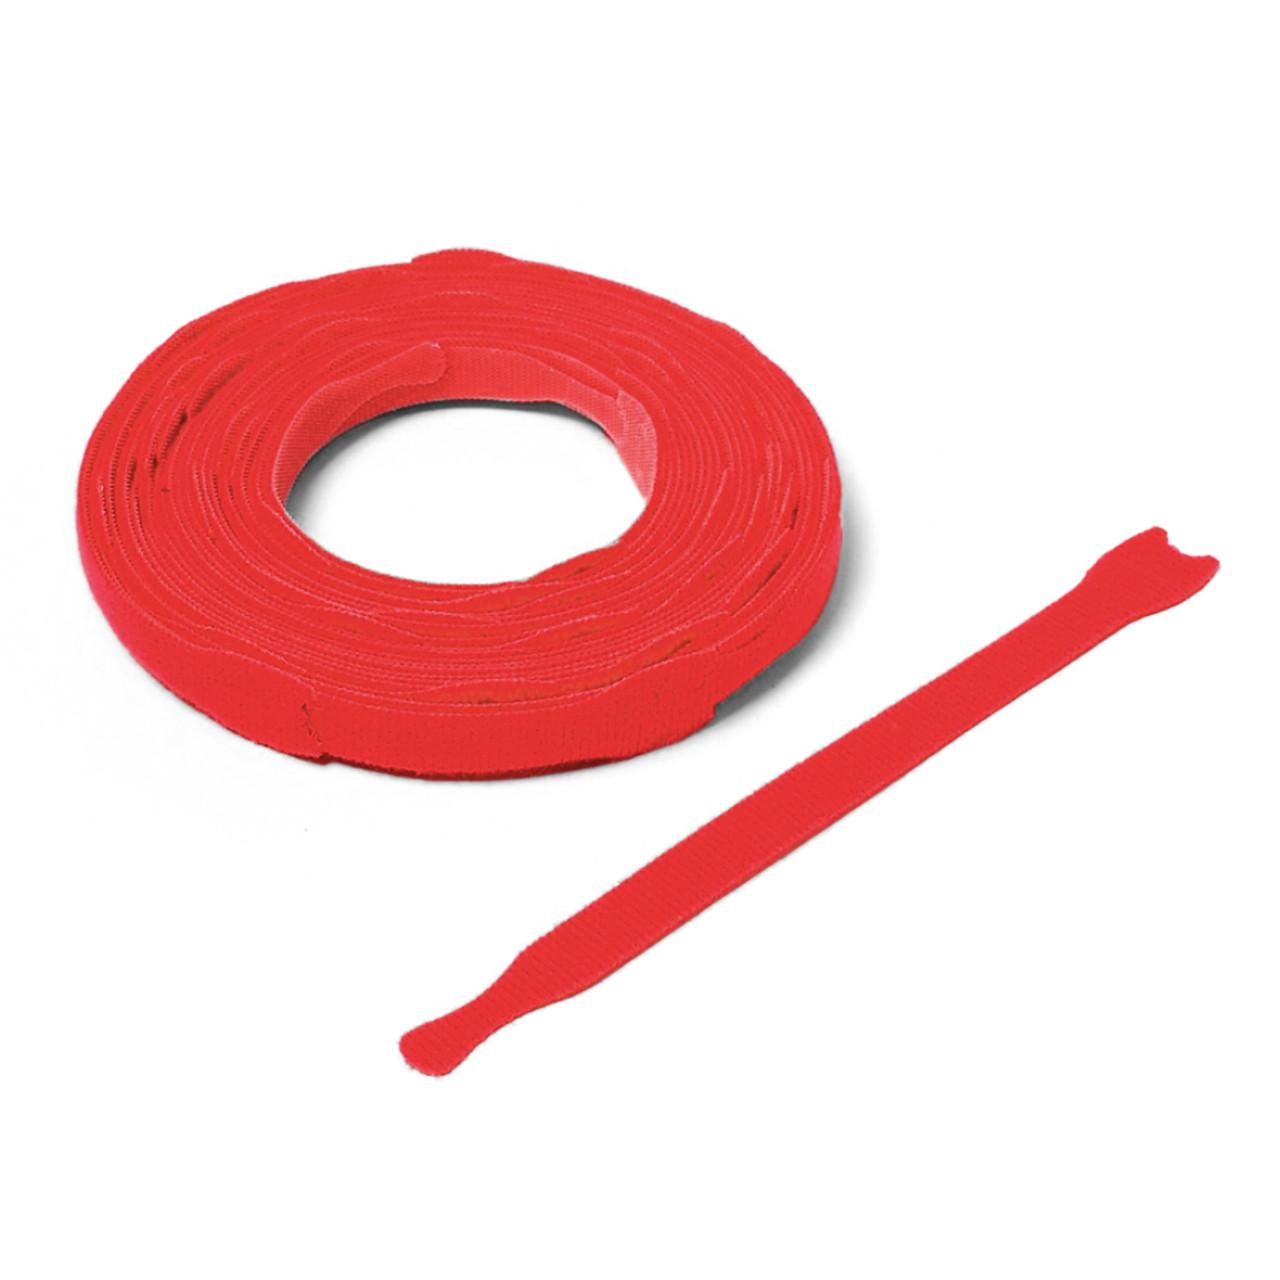 VELCRO ® Brand ONE-WRAP ® Die-Cut Straps - Red